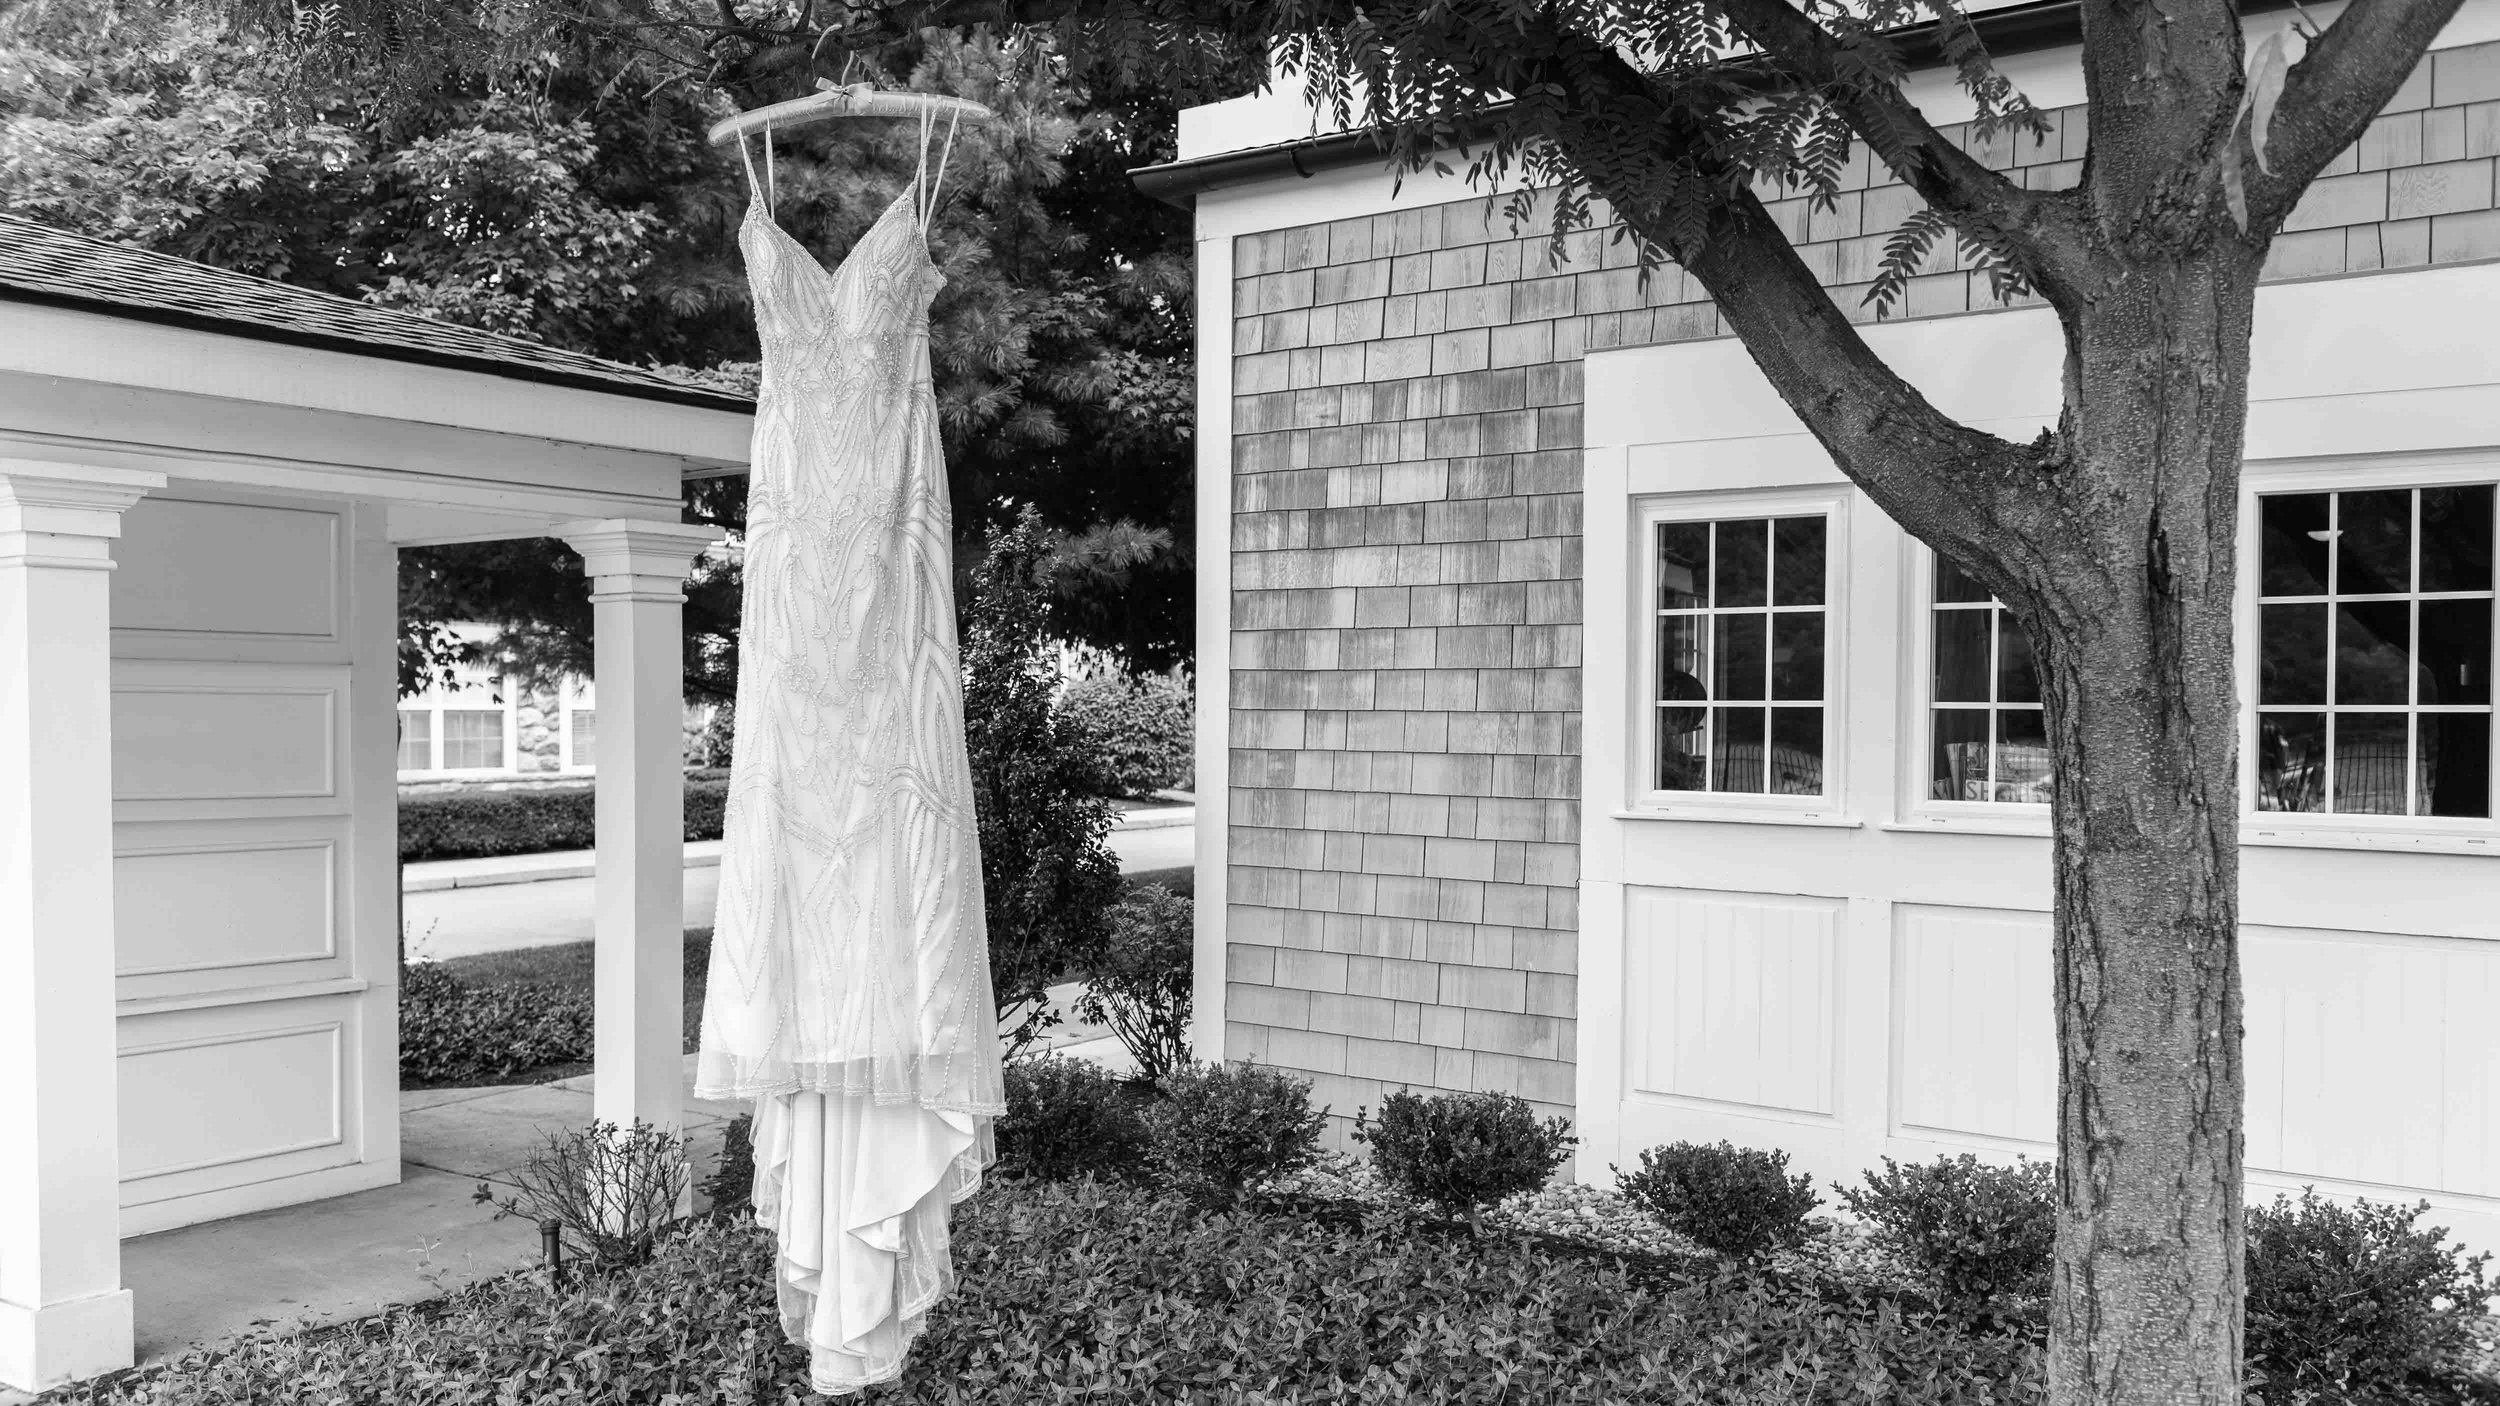 Bride-Wedding-Dress-Hanging-from-Tree-BW.jpg